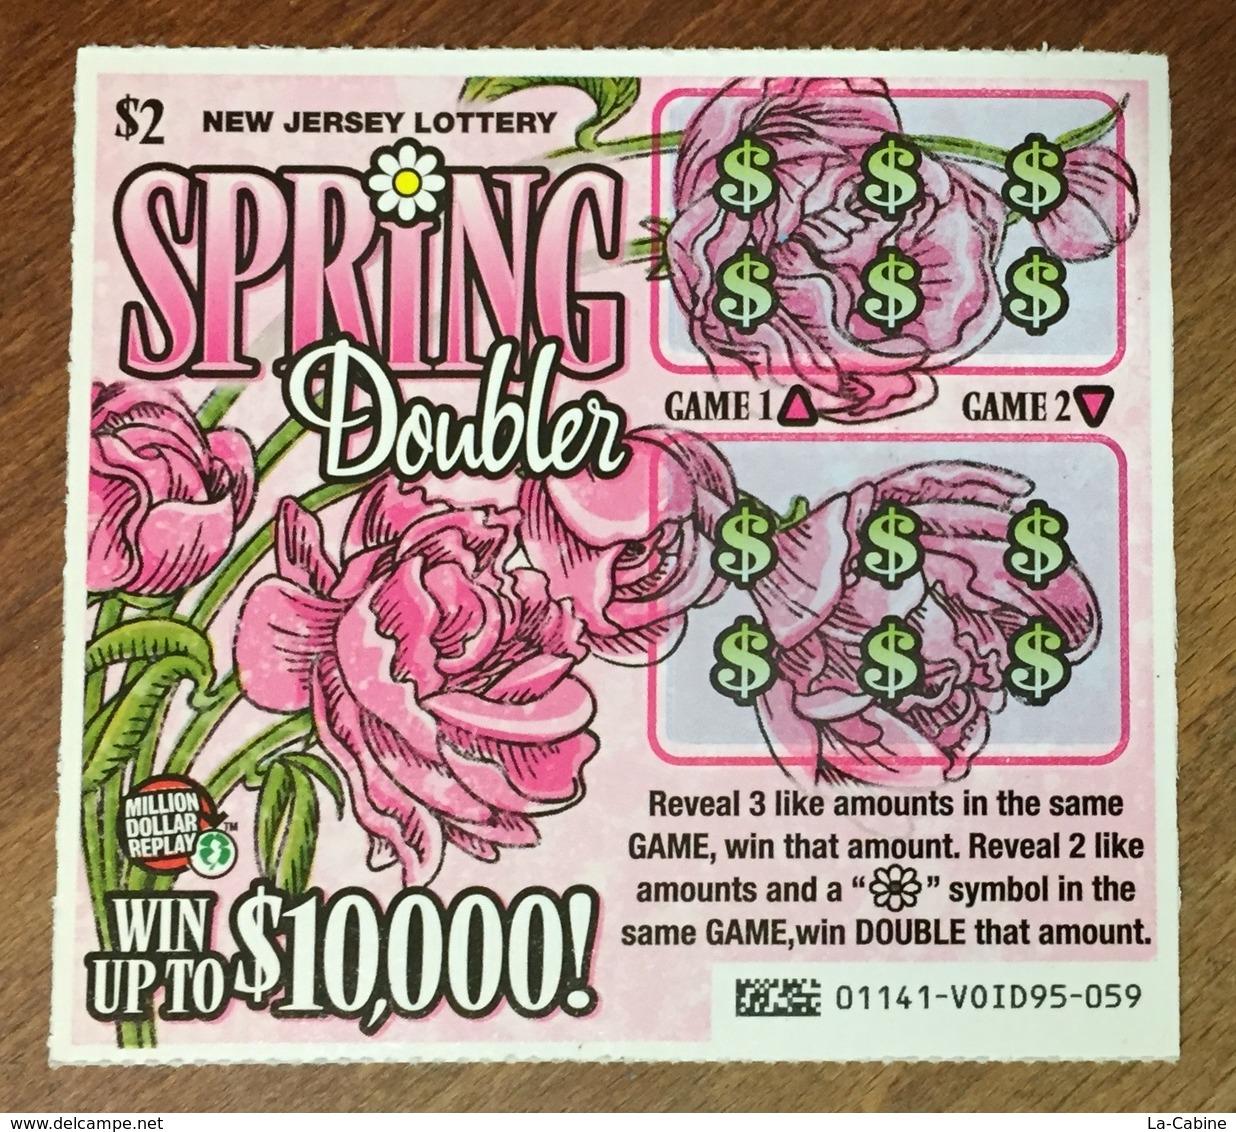 USA NEW JERSEY LOTTERY ROSES FLEURS FLOWERS 1 BILLET SPÉCIMEN VOID TICKET A GRATTER DE LOTERIE NEUF - B. Flower Plants & Flowers